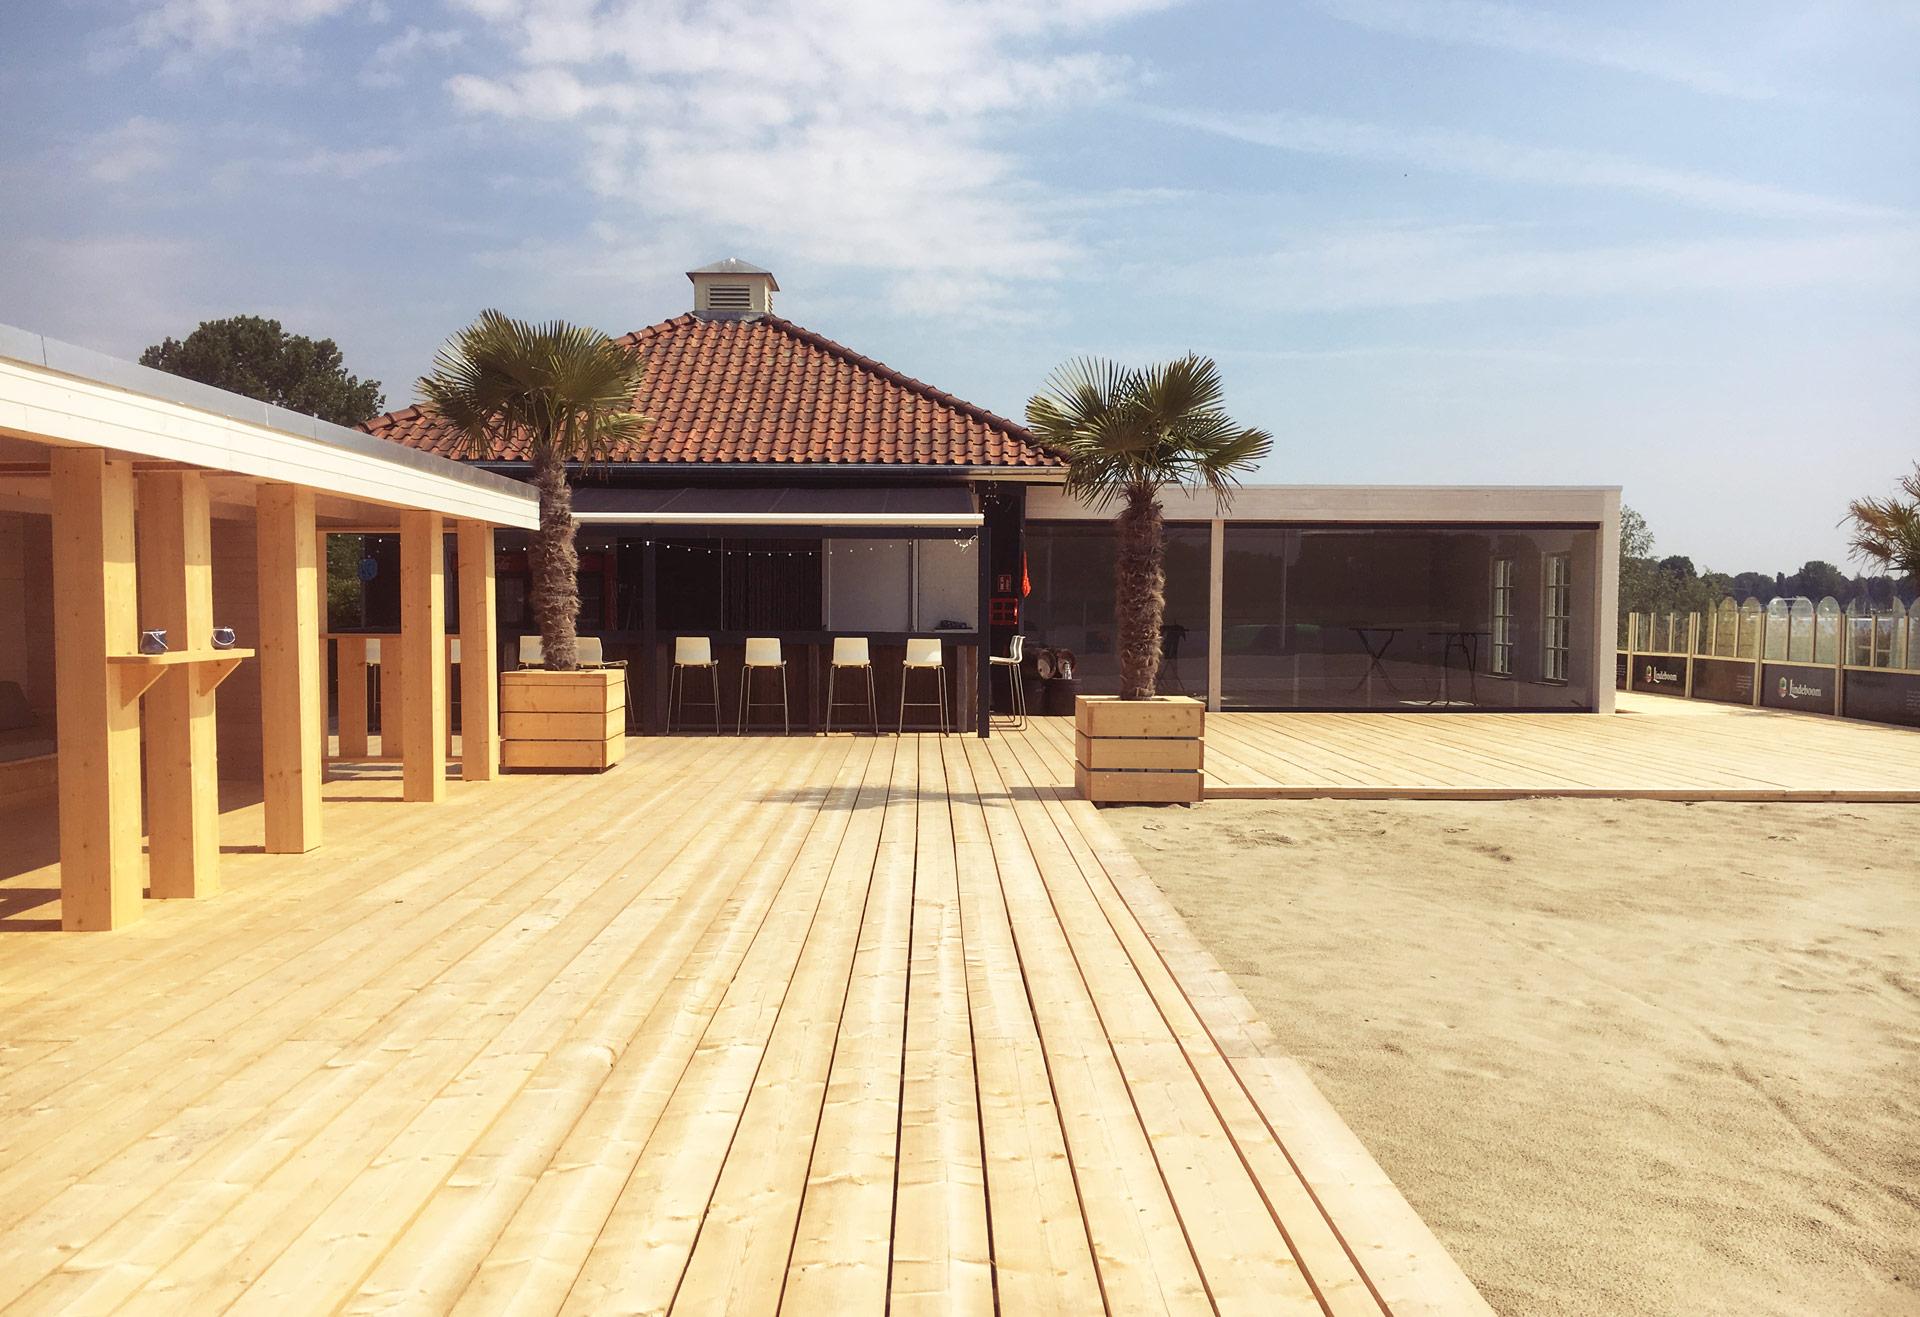 Area-X-De-Weerd-Roermond-Beachclub-Palm-Beach-2_1920px